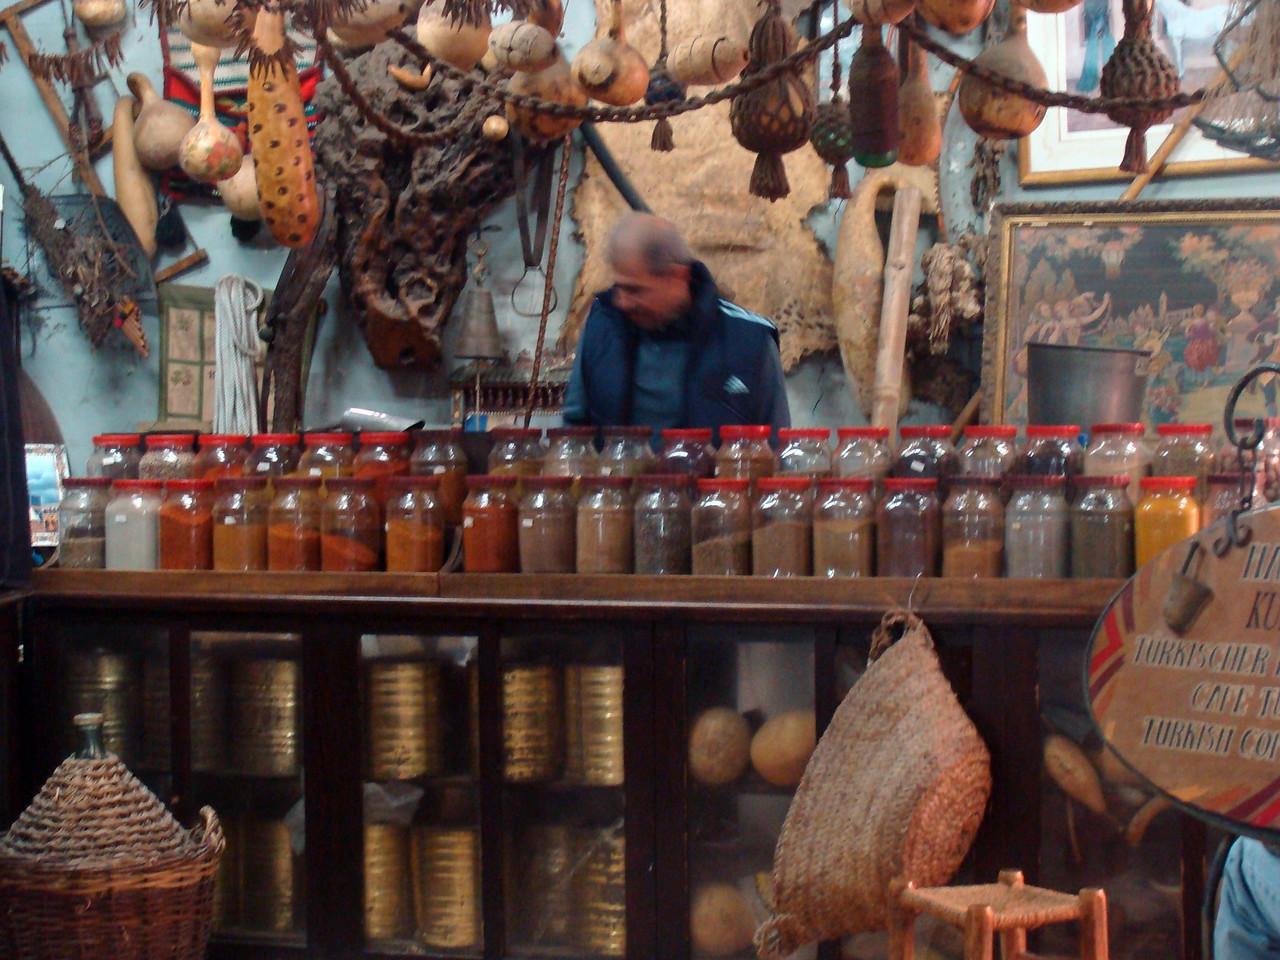 Spice Jars and Turkish Coffee